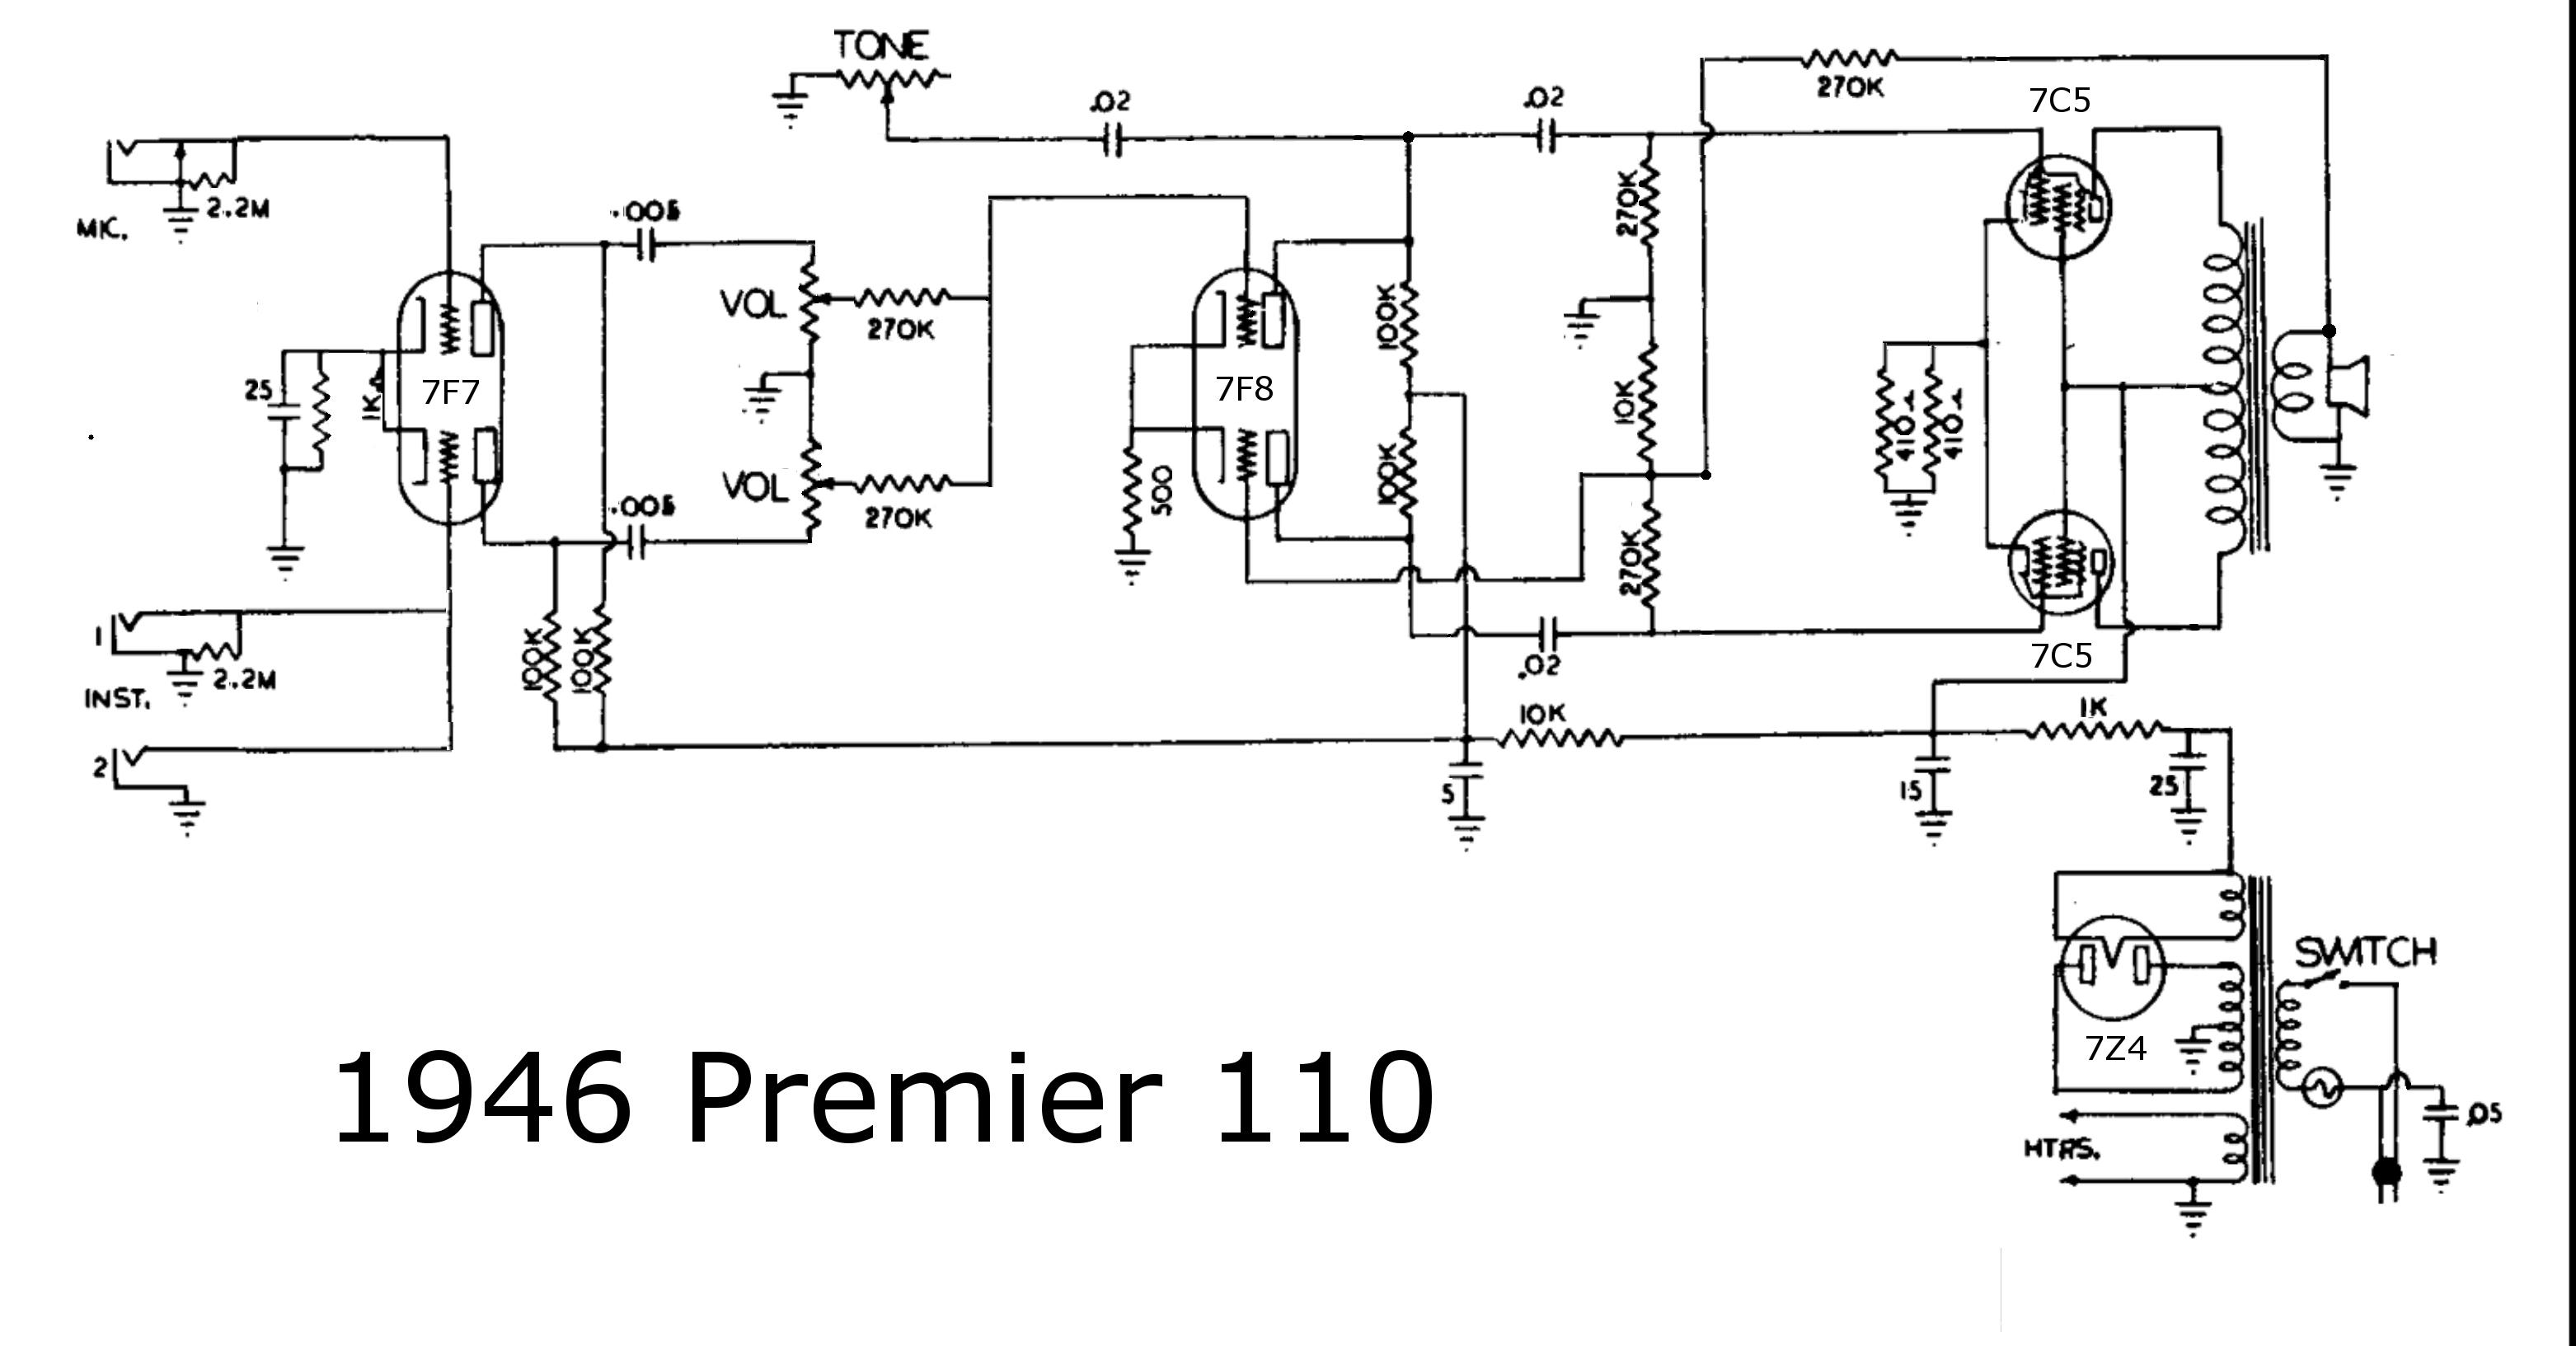 premier amp schematic prowess amplifiers - misc - schematics - premier 110 - all ... #1